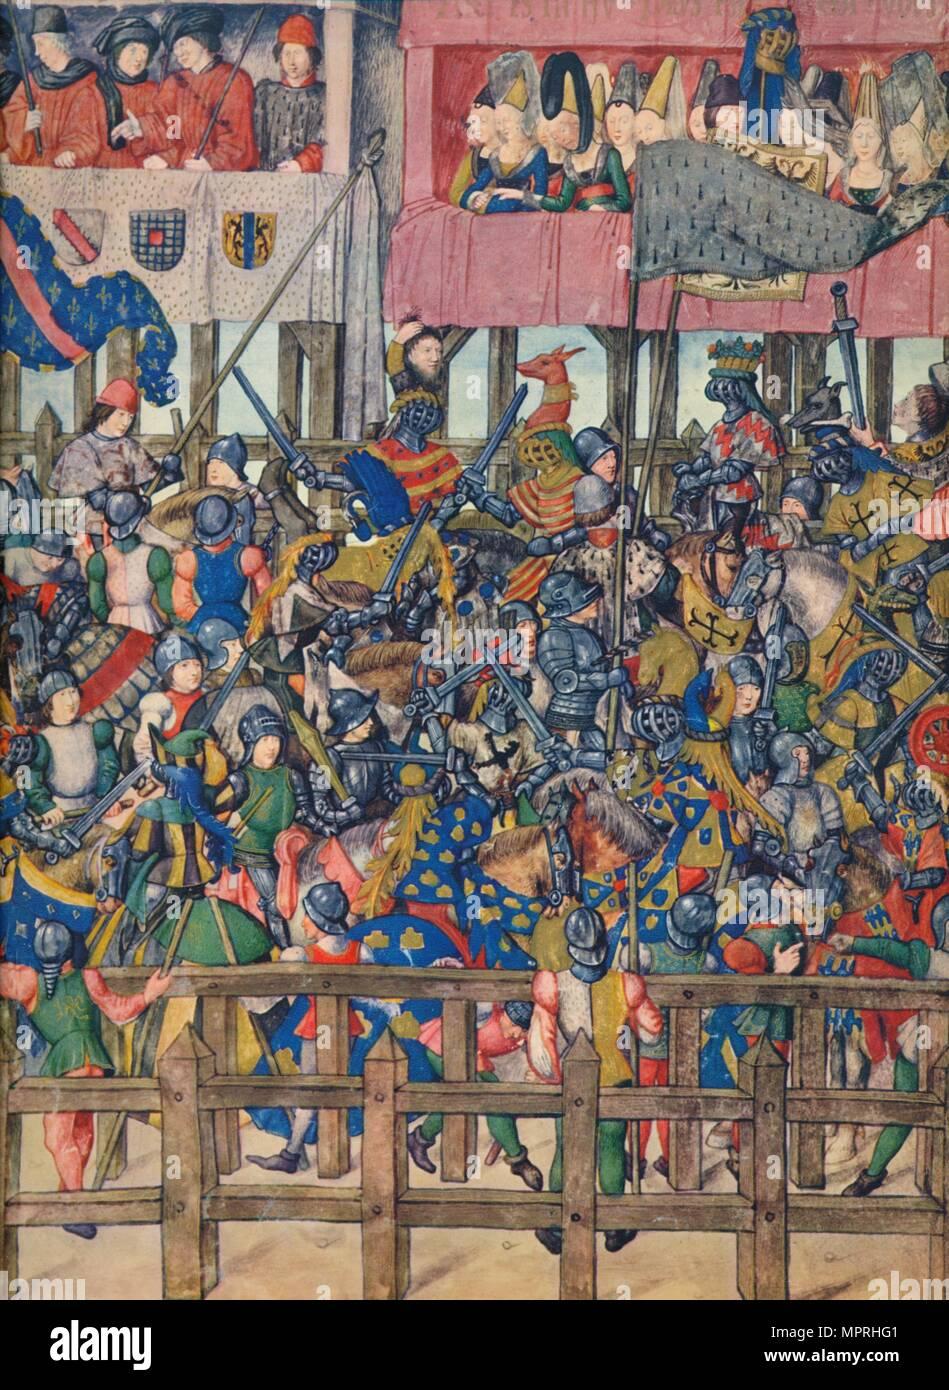 'End of the Tournament at Bruges, March 11, 1392', c15th century, (1937). Artist: Emile- Aurele Van Moe. - Stock Image